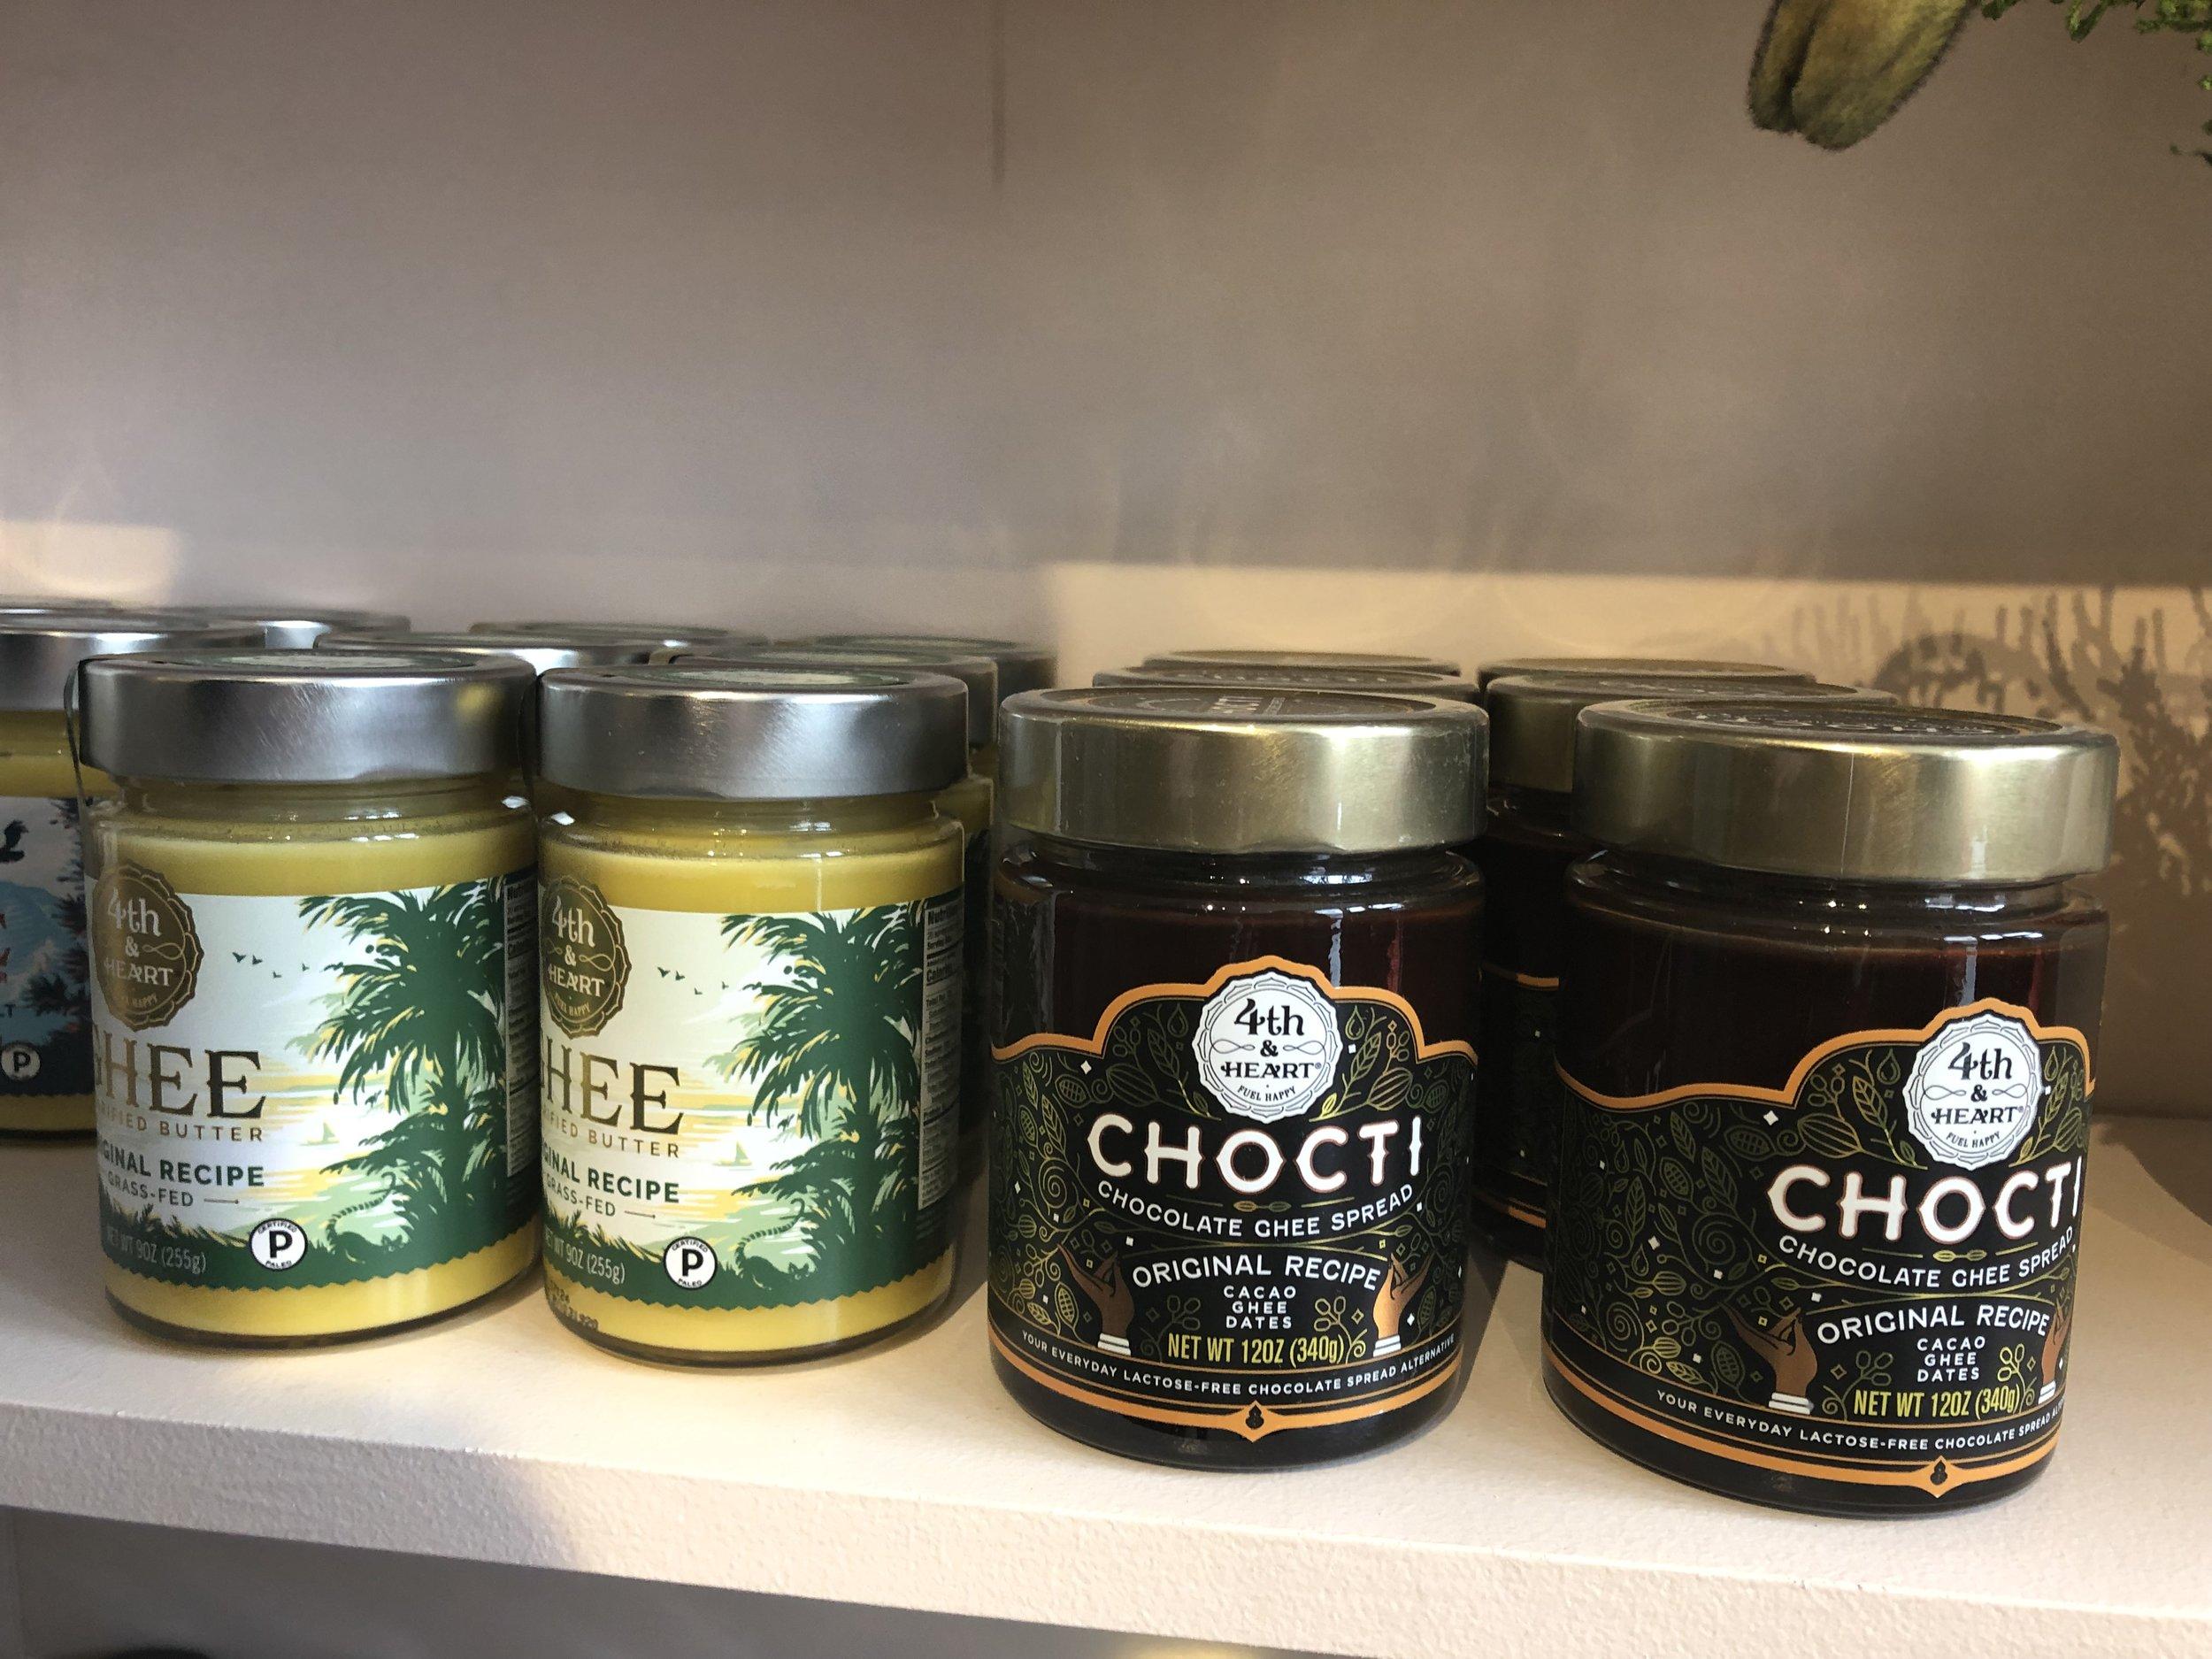 Chocti Chocolate Ghee Spread